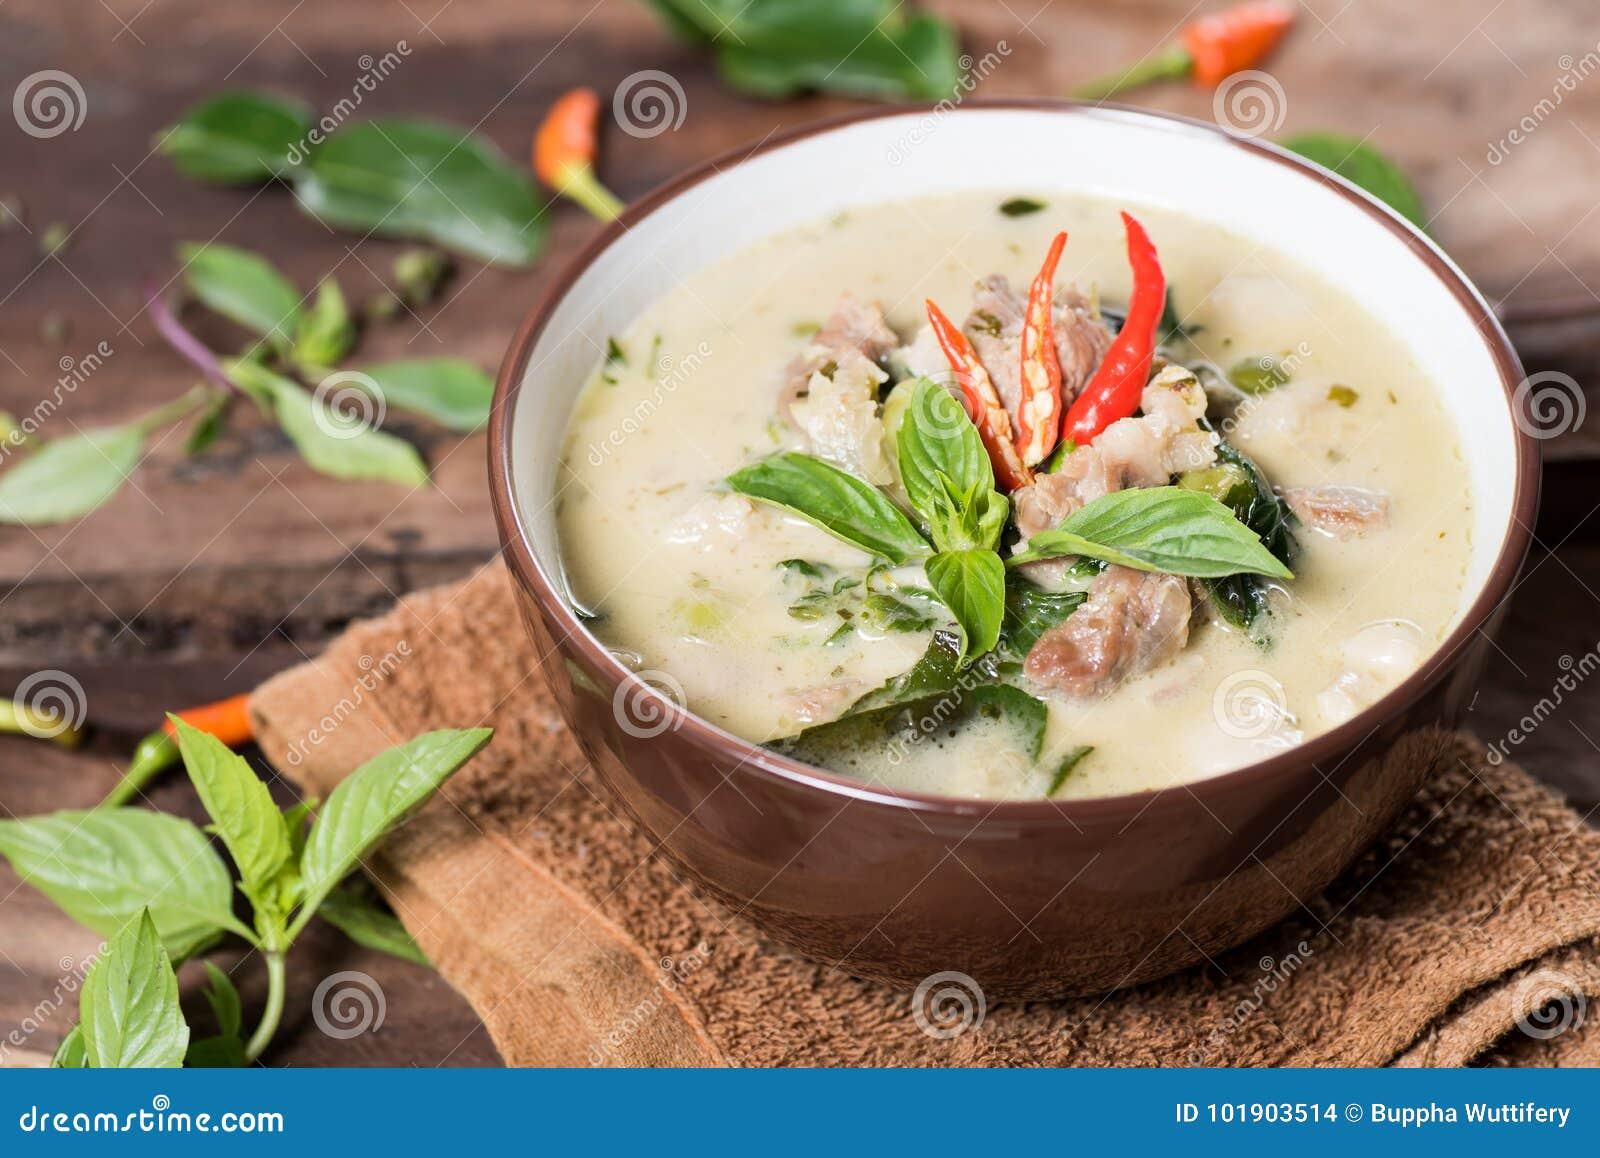 Thai food Kaeng Khiao Wan,Green curry with pork